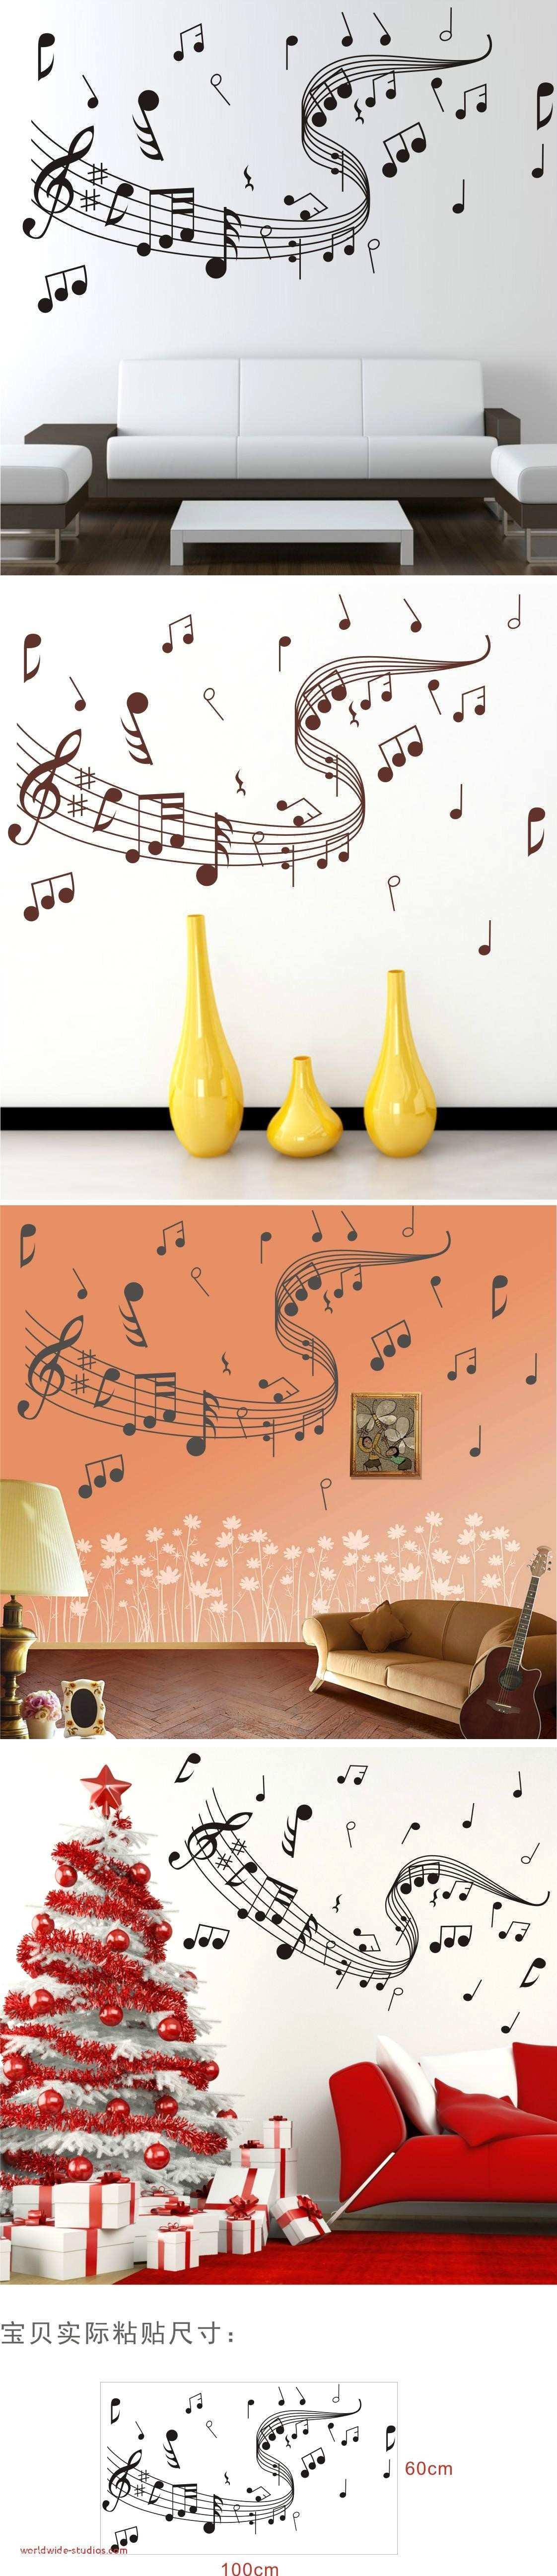 Diy Flower Vase Decoration Of Little Flower Wall Decor Of Diy Home Decor Vaseh Vases Decorative for Inspiring Flower Wall Decor with top Result 100 Awesome Diy Backdrop Design Gallery 2018 Kae2 2017